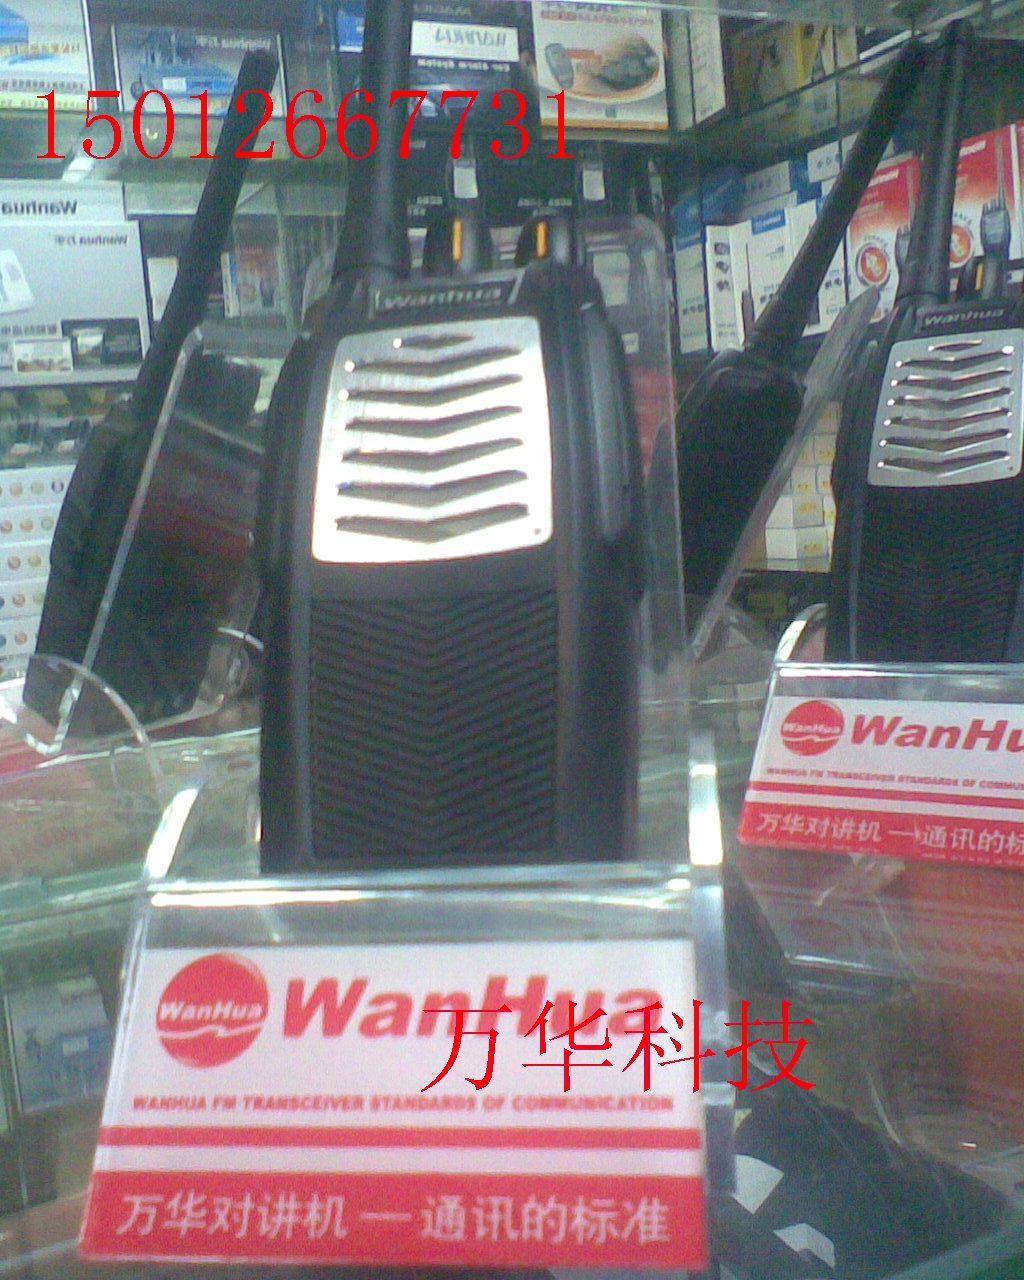 Wanhua wh29 walkie talkie walkie talkie civil 5 km of a pair of 240 yuan hand professional walkie talkie(China (Mainland))